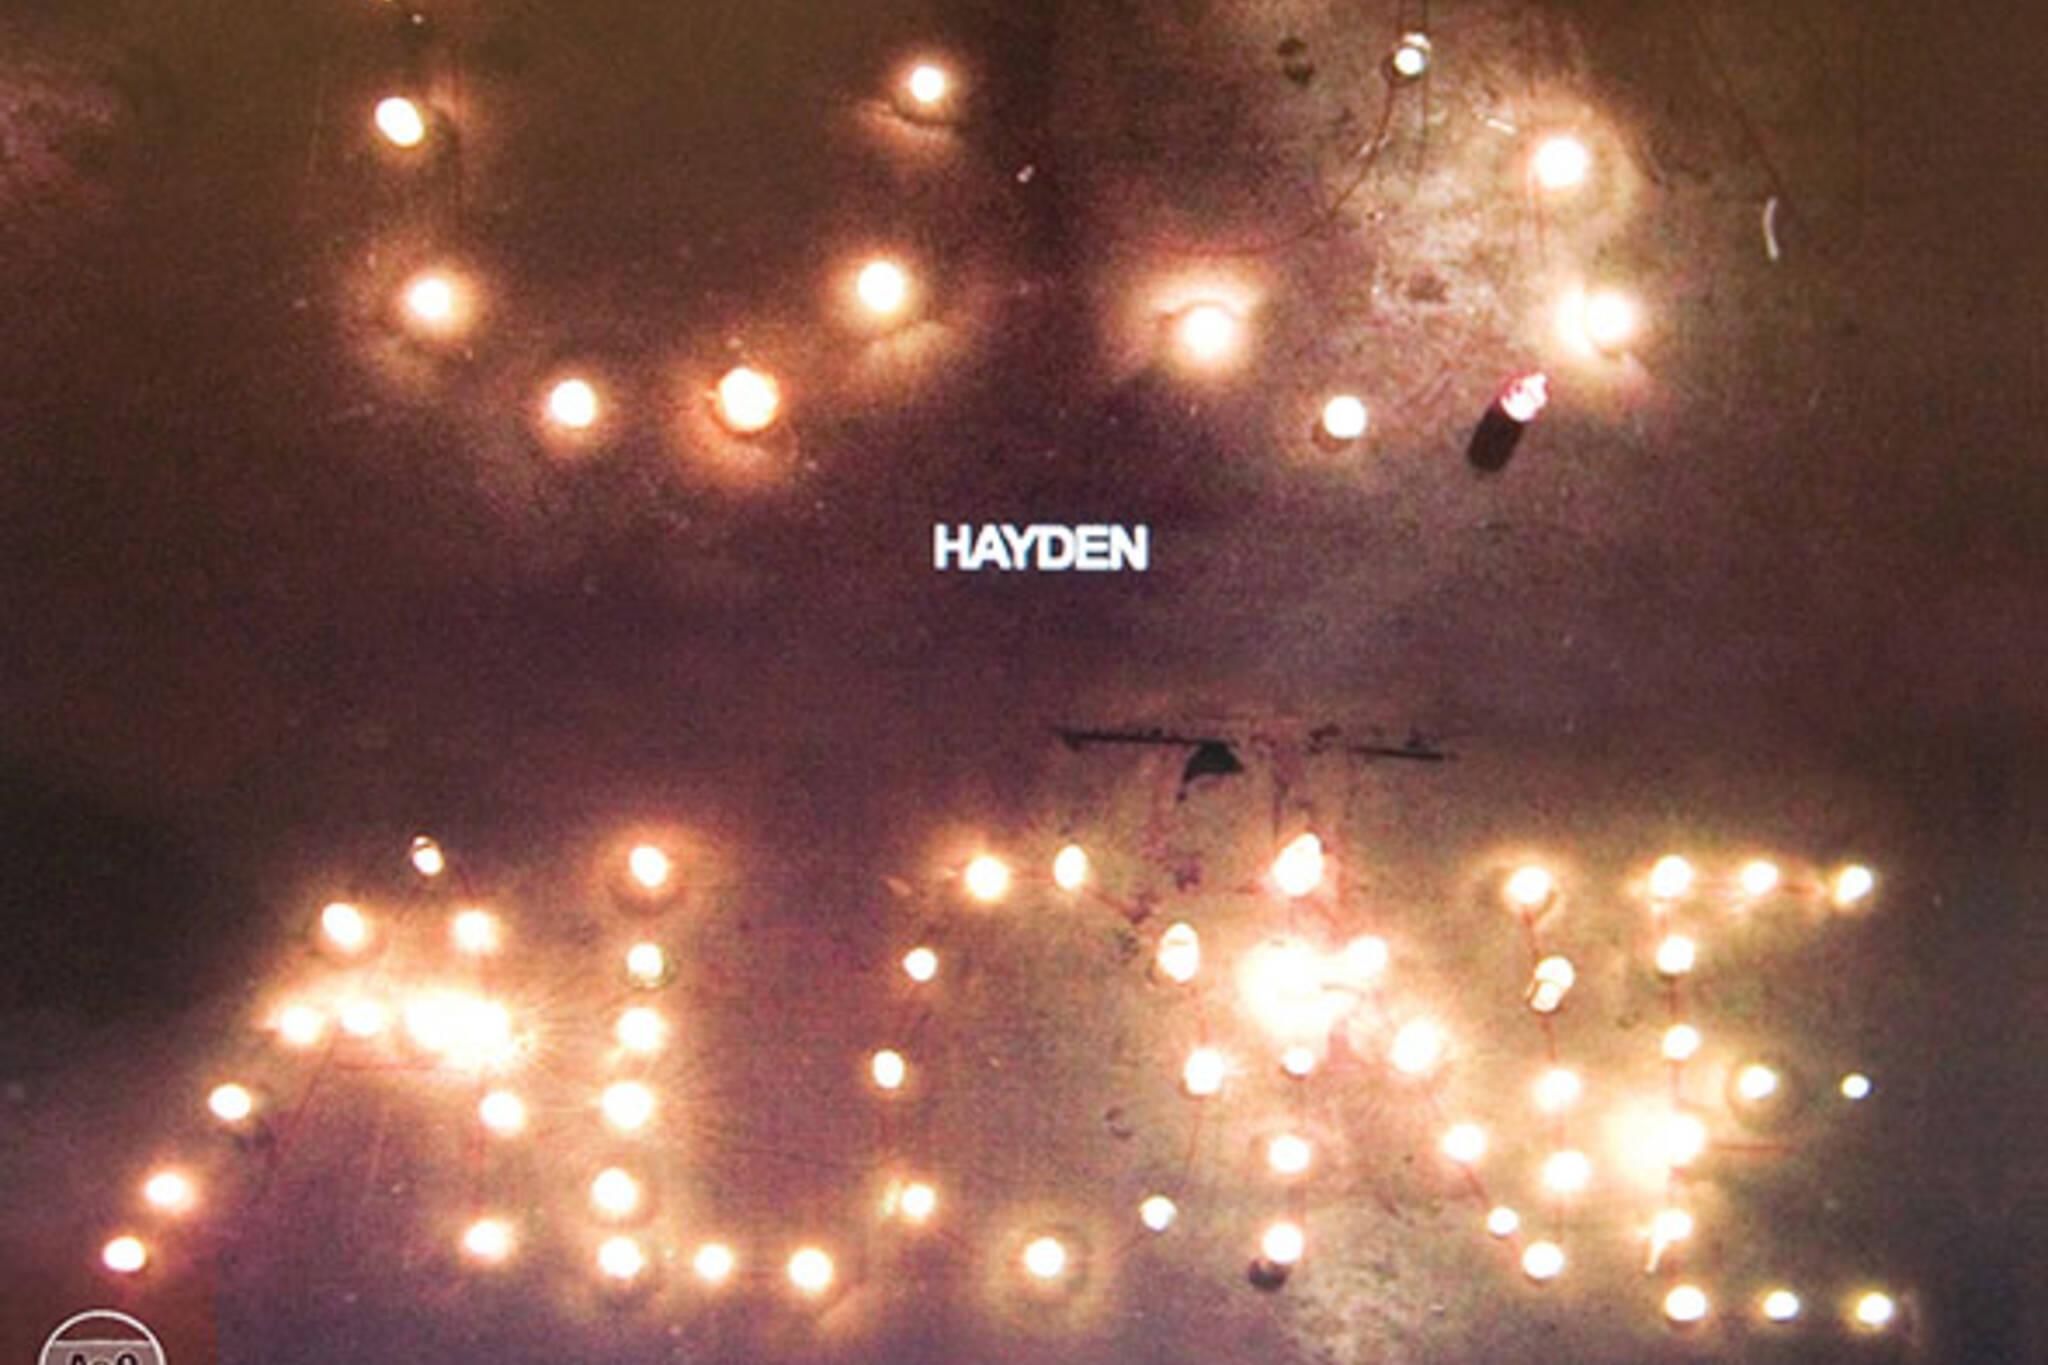 hayden us alone album